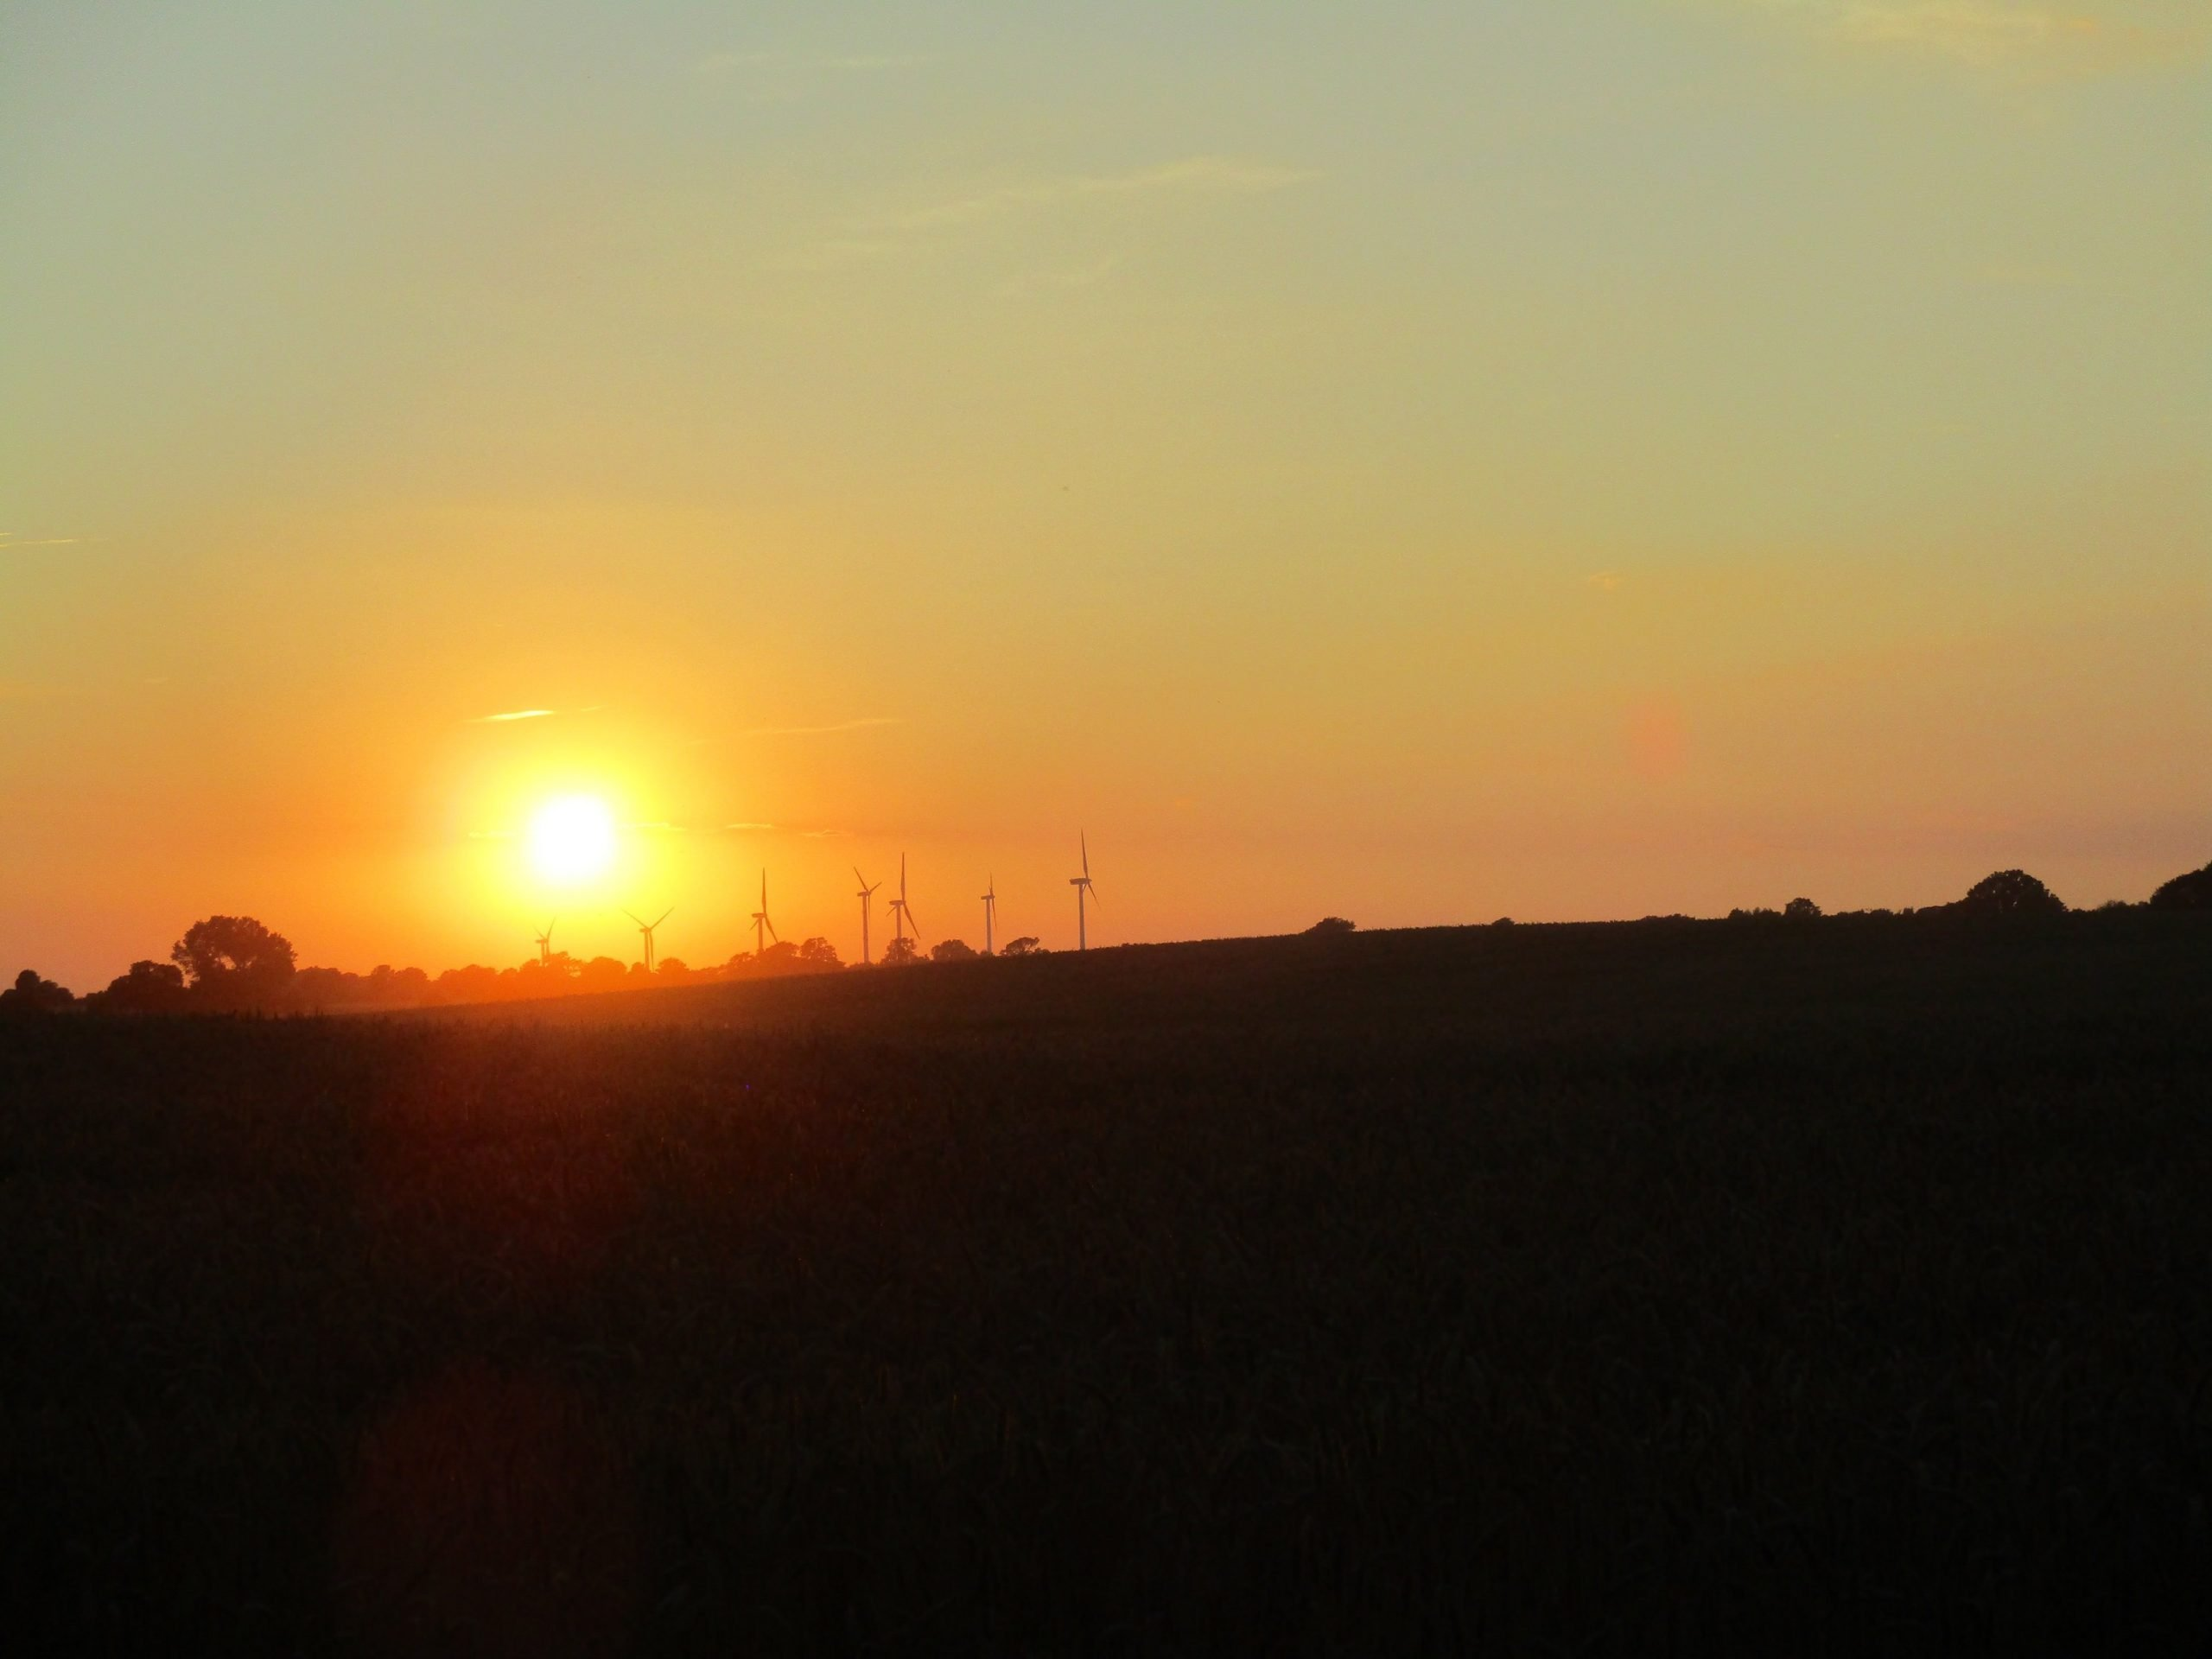 A Windfarm at Sunset